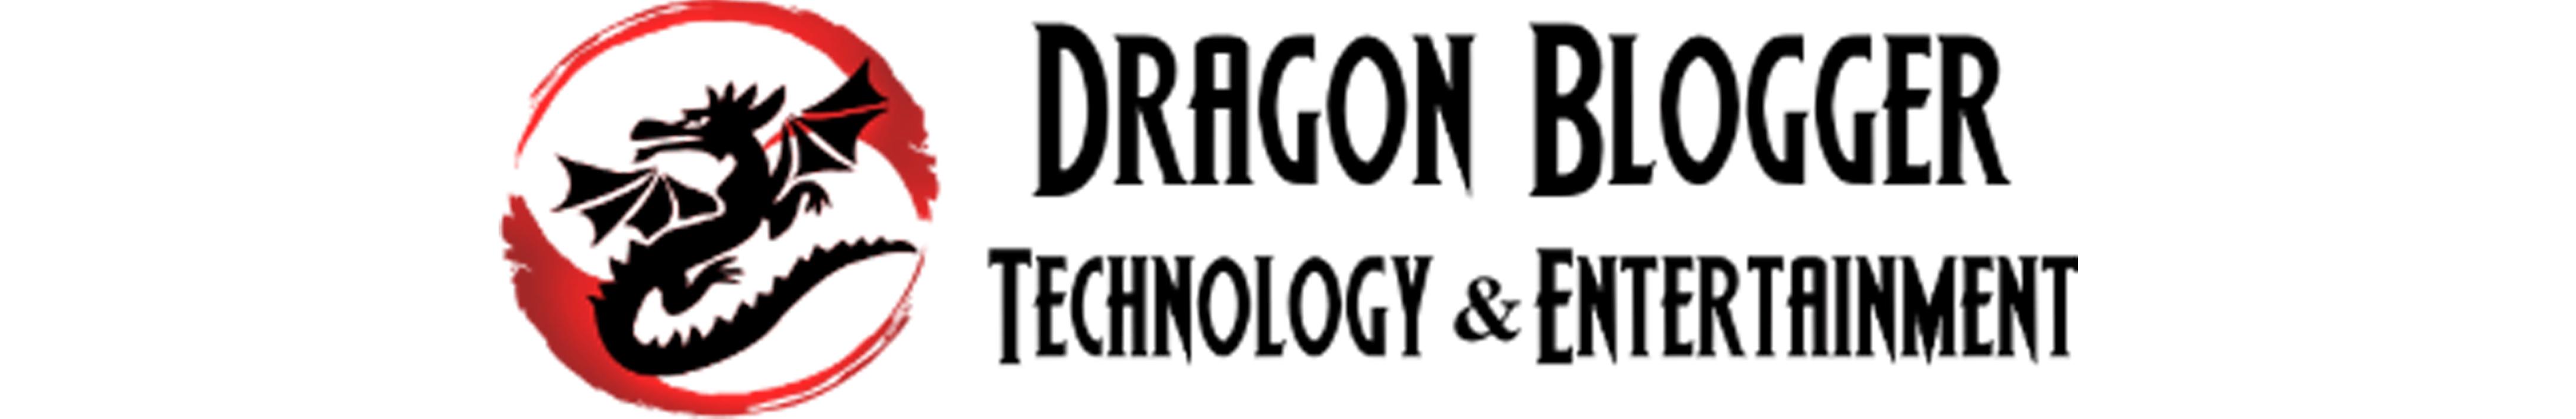 Dragon Blogger